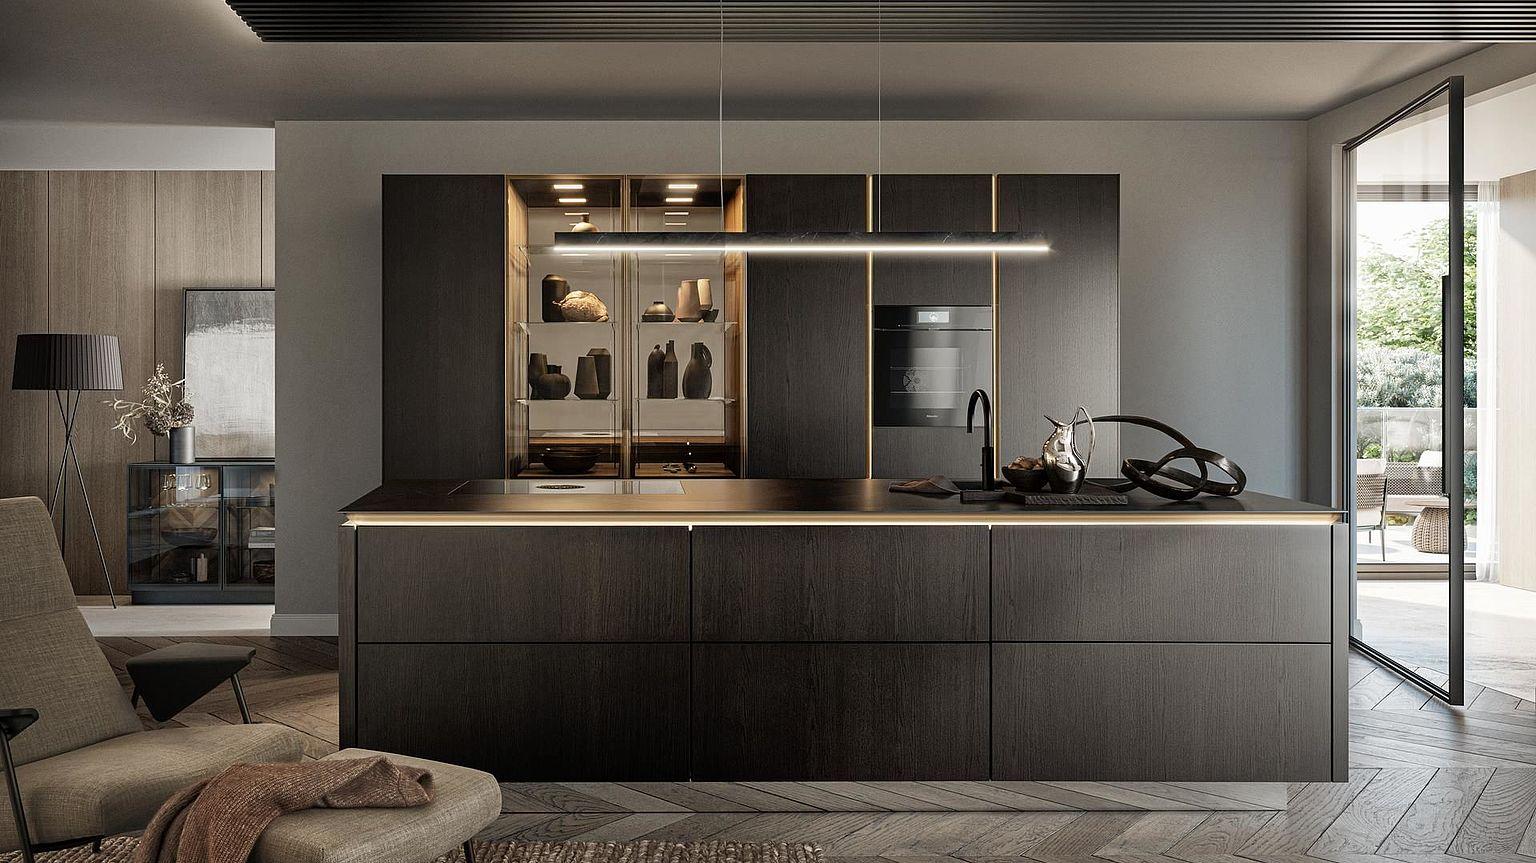 SieMatic Kitchen Interior Design of Timeless Elegance |